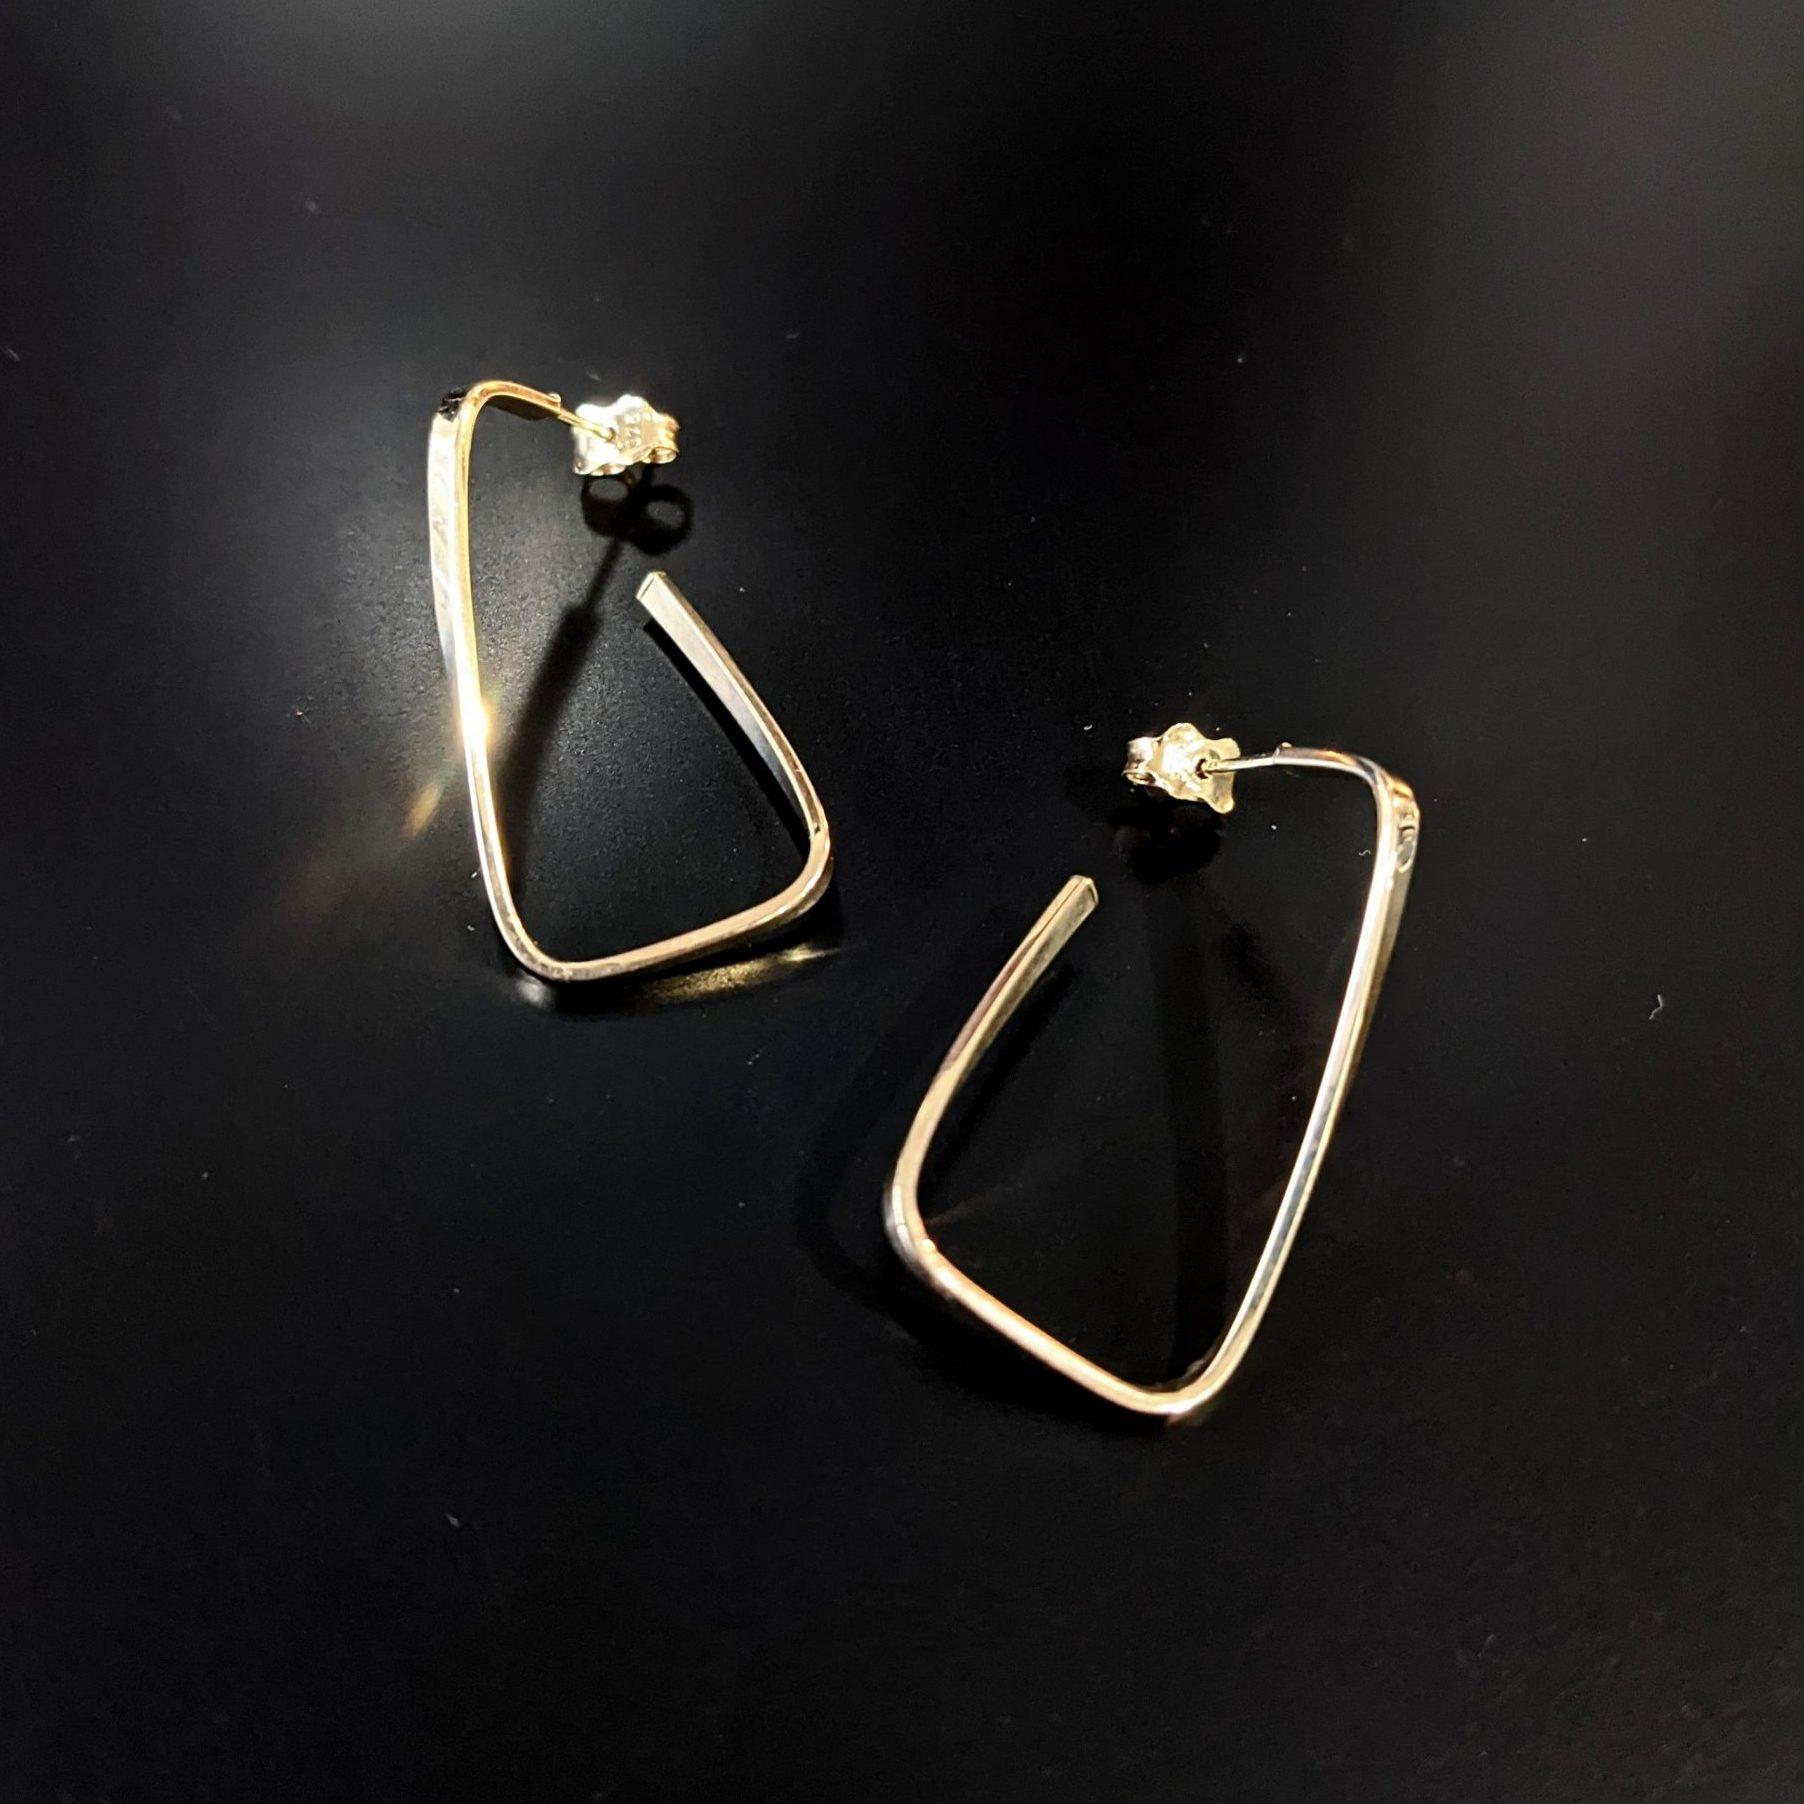 yellow gold earrings